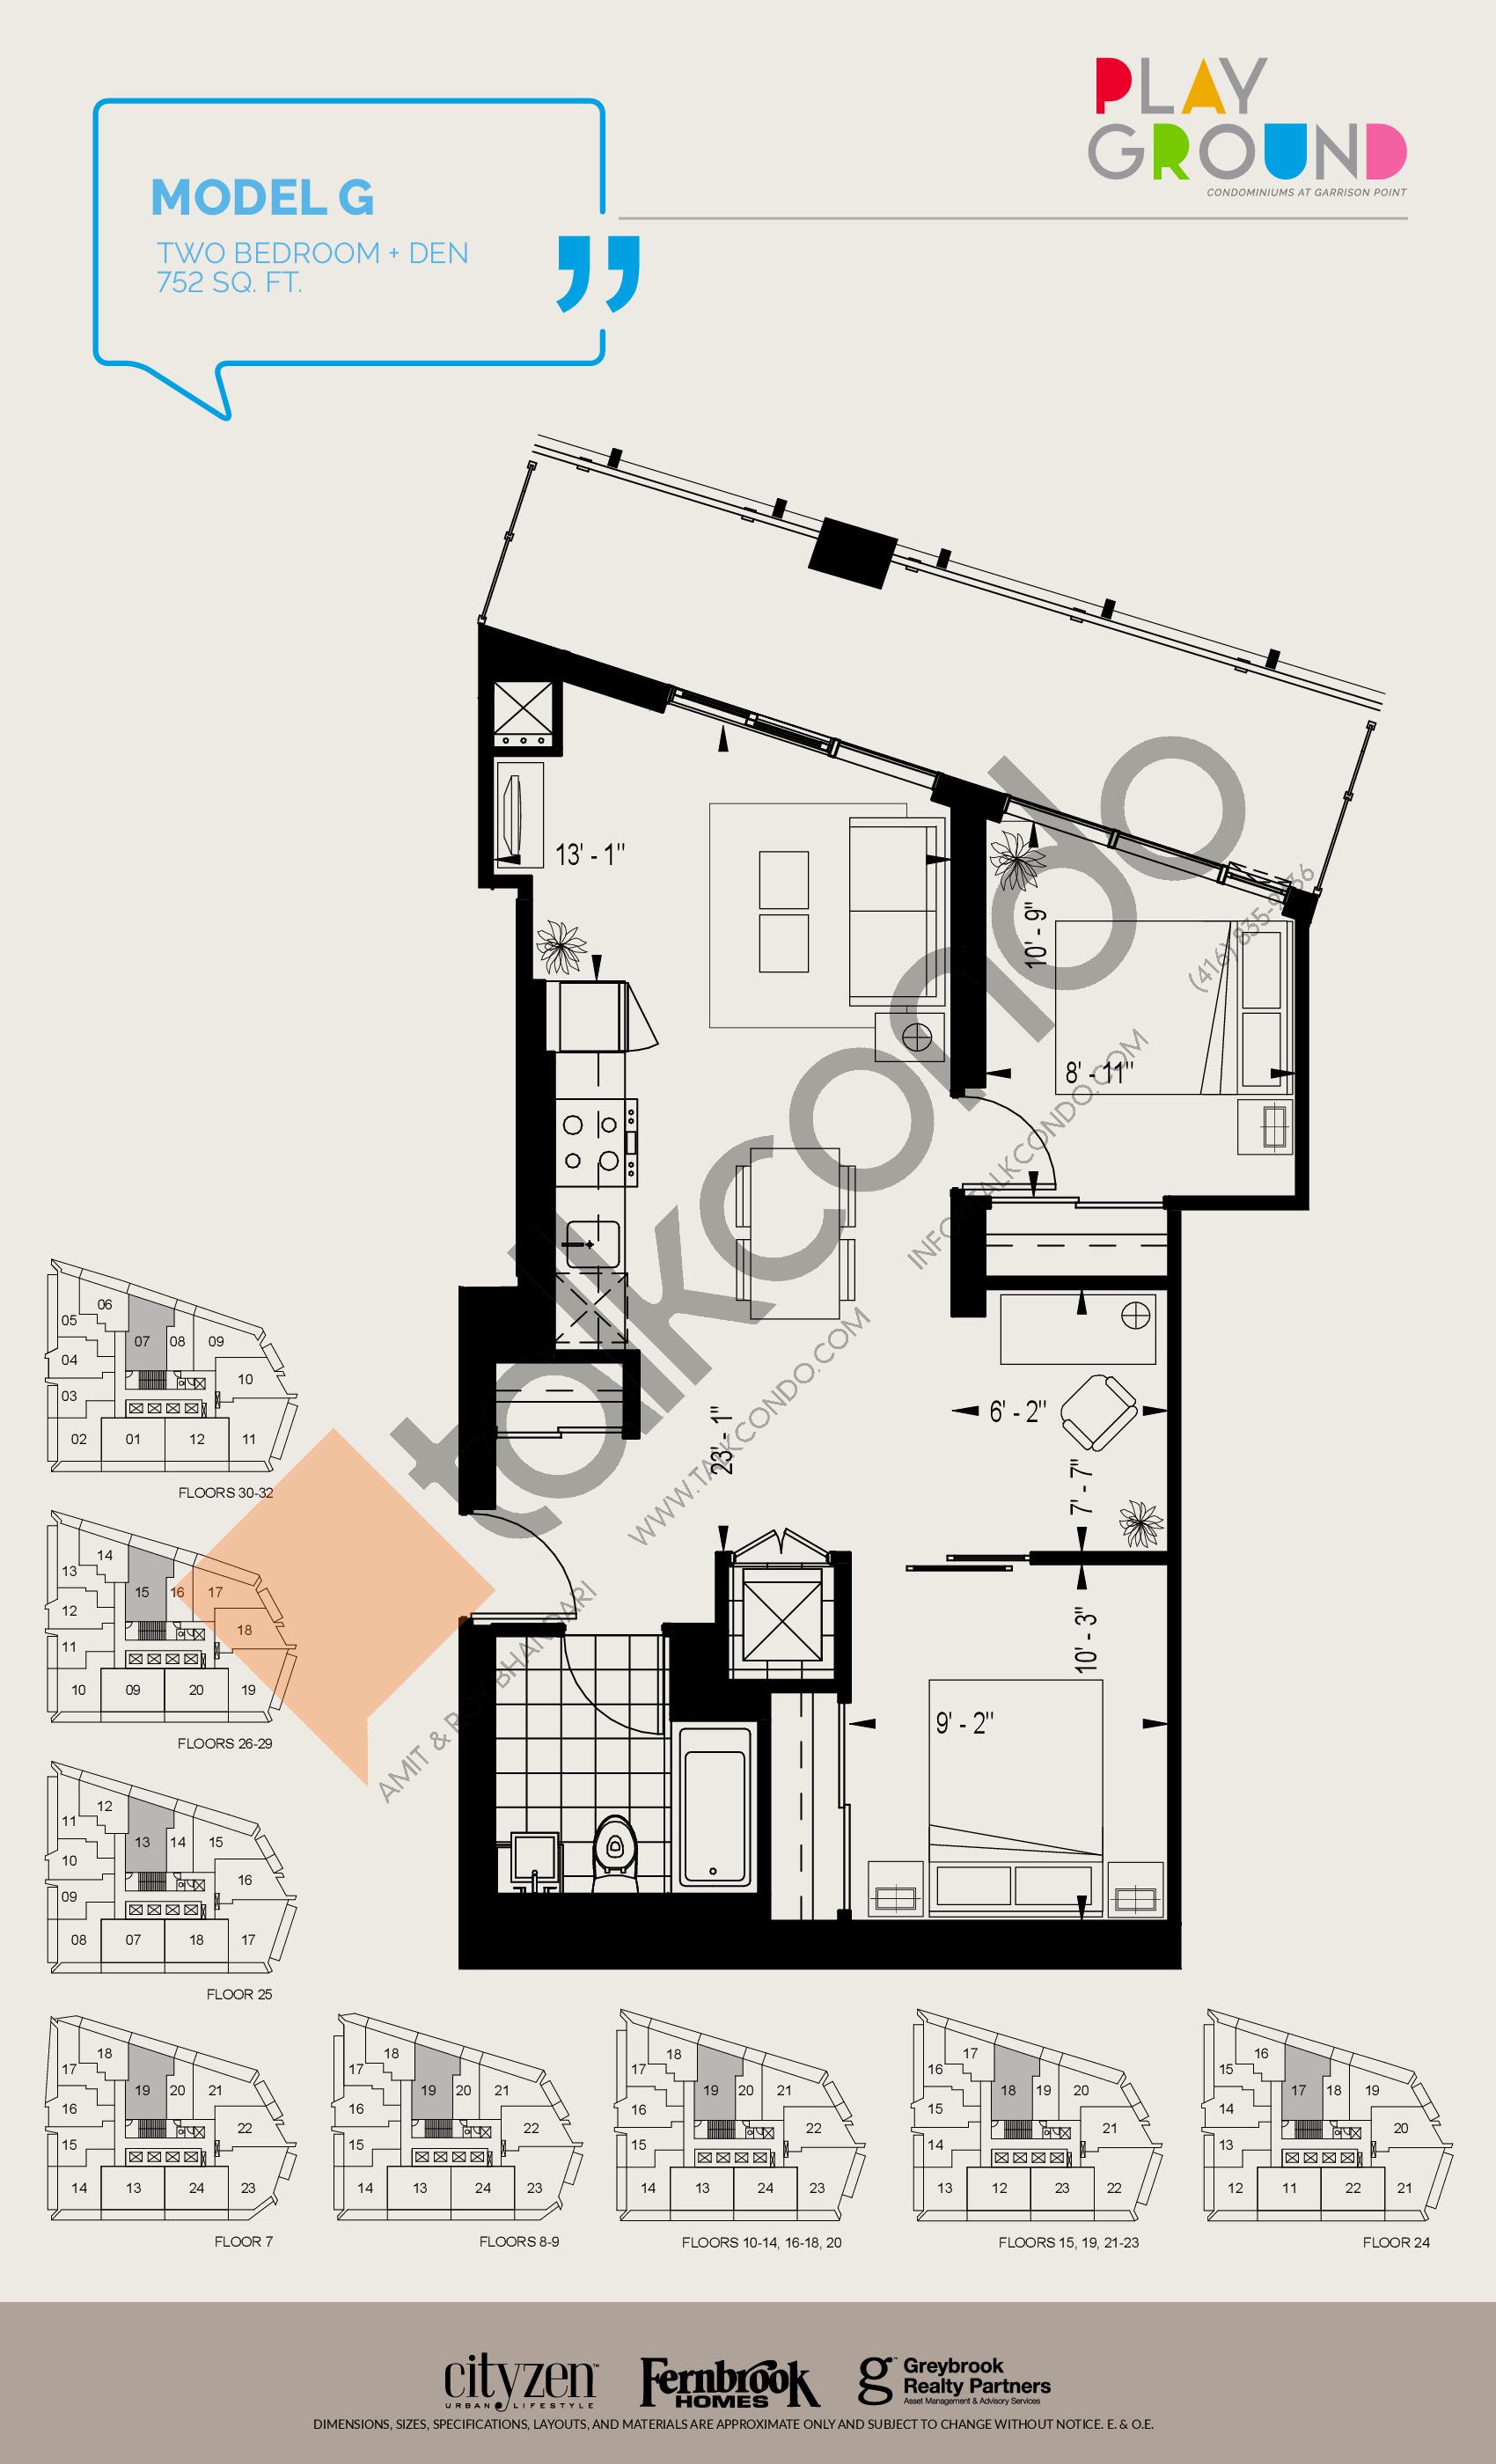 Model G Floor Plan at Playground Condos at Garrison Point - 752 sq.ft